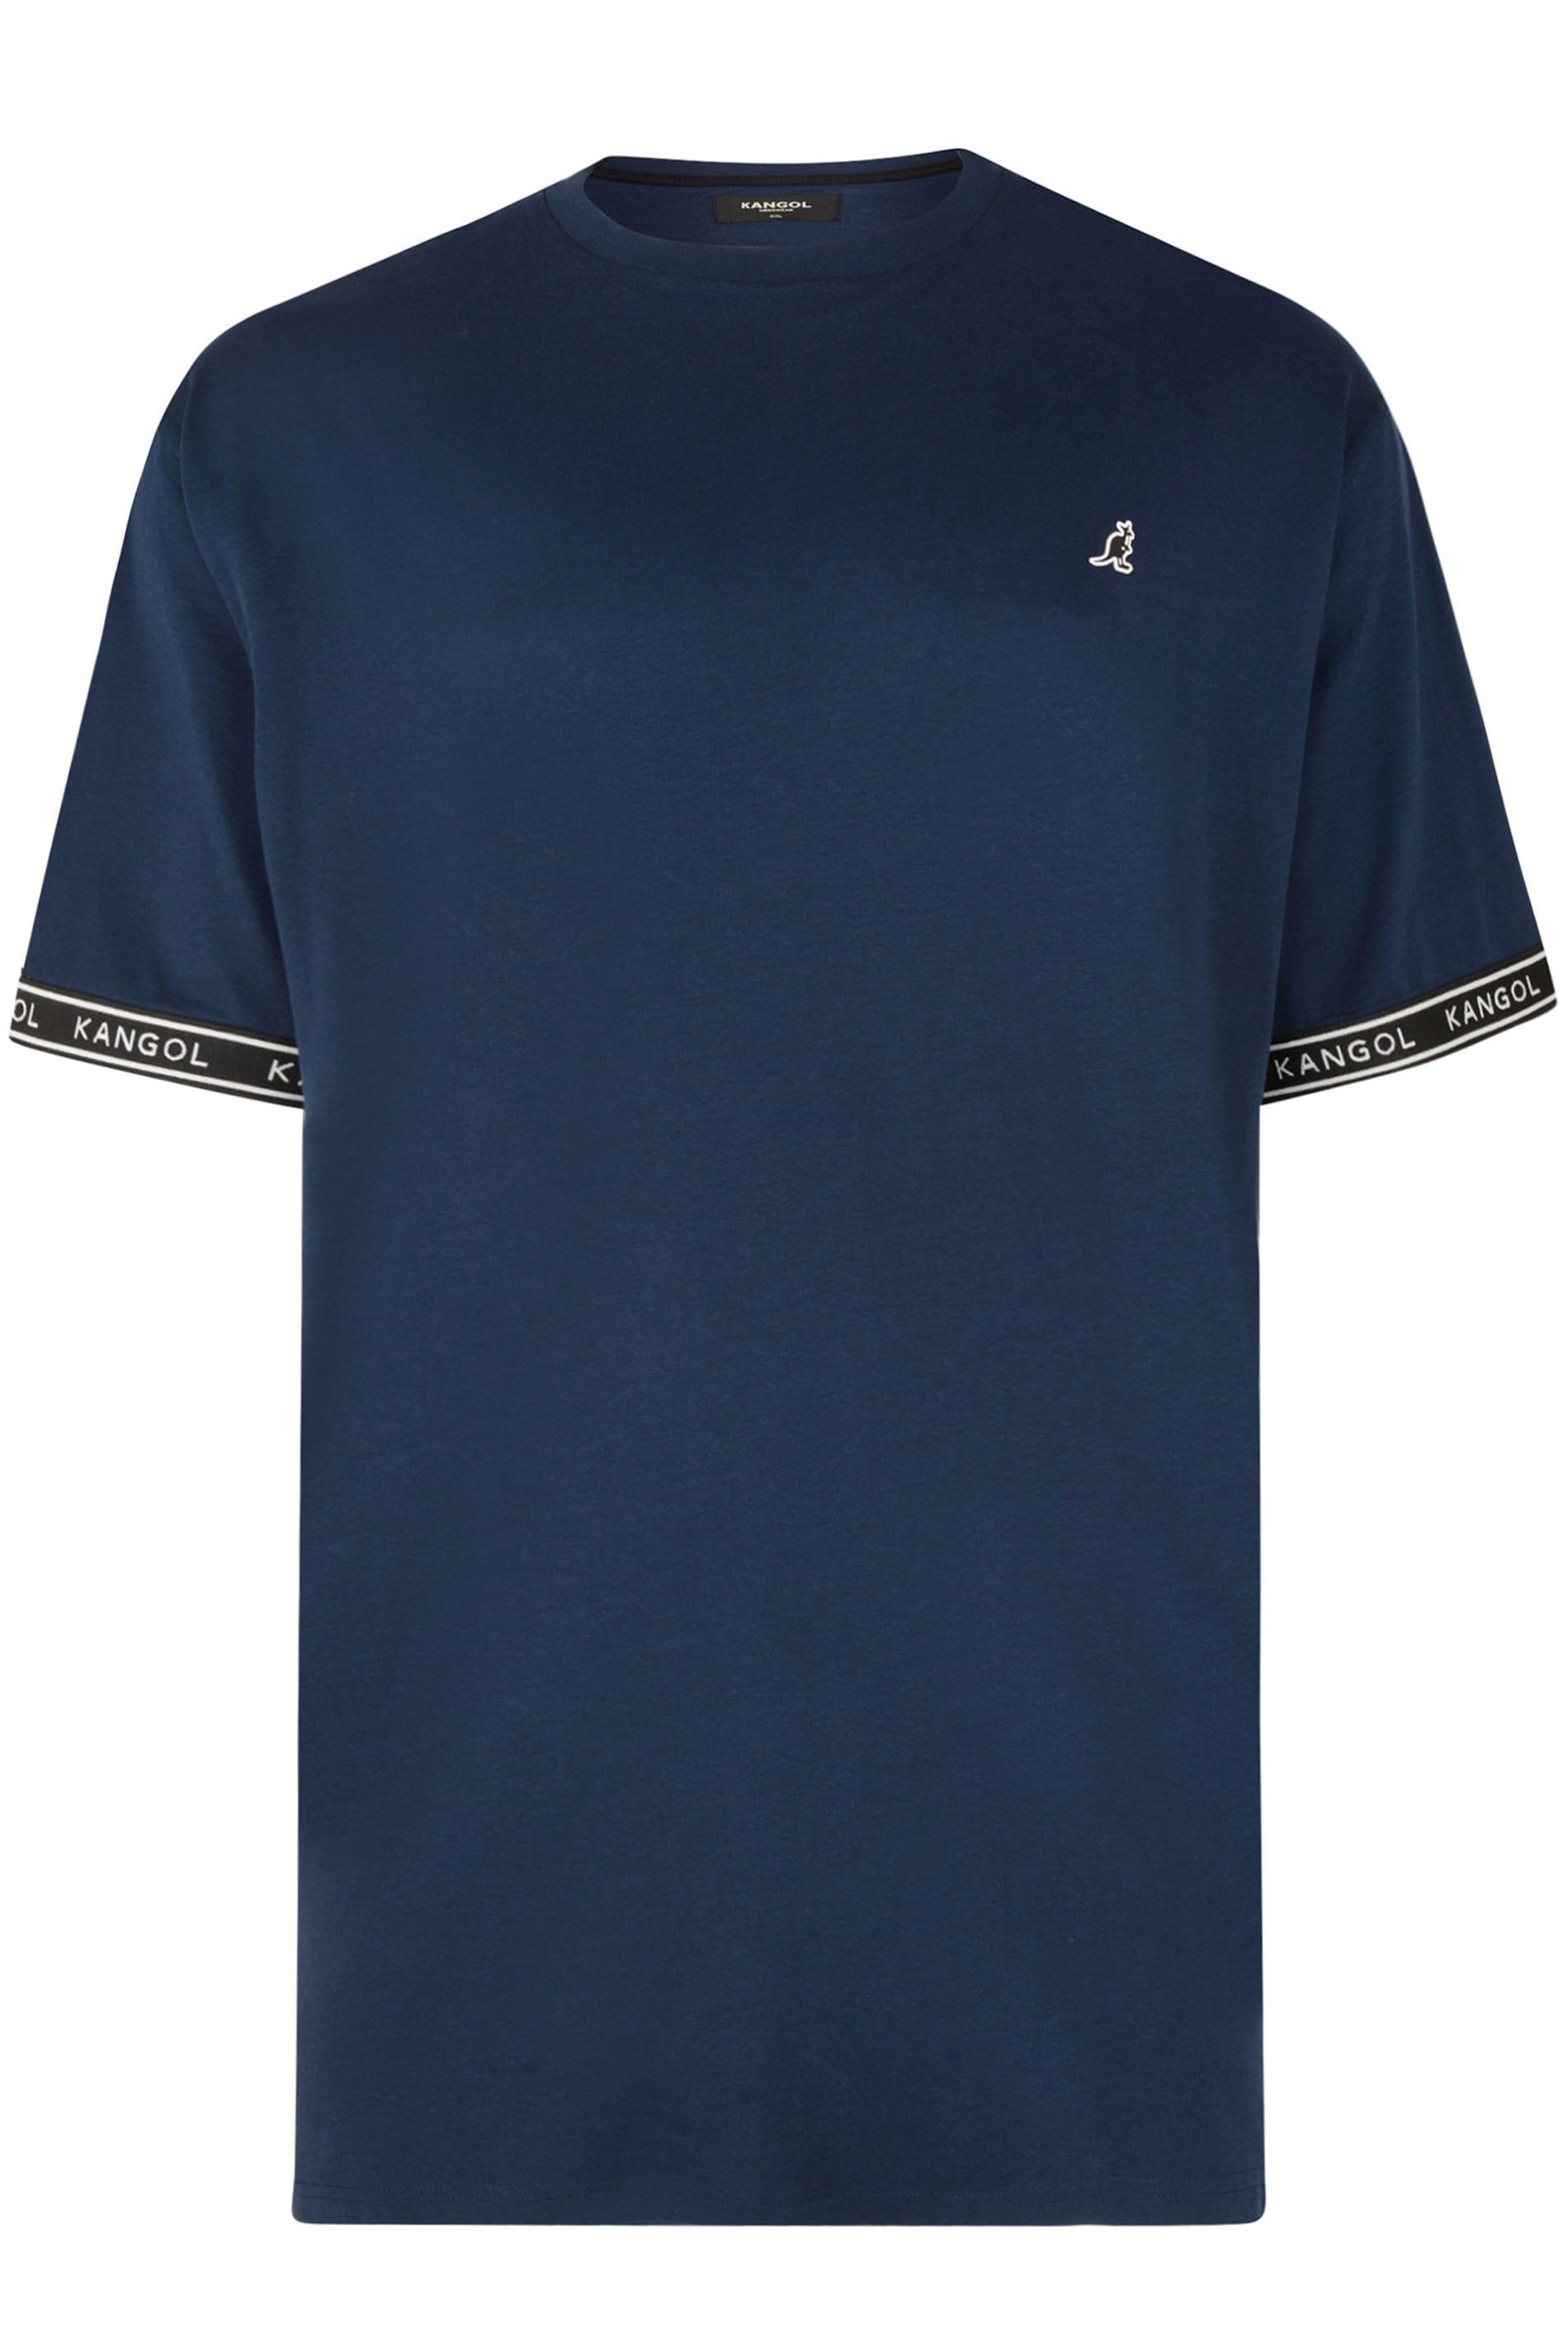 KANGOL Navy Taped Sleeve T-Shirt